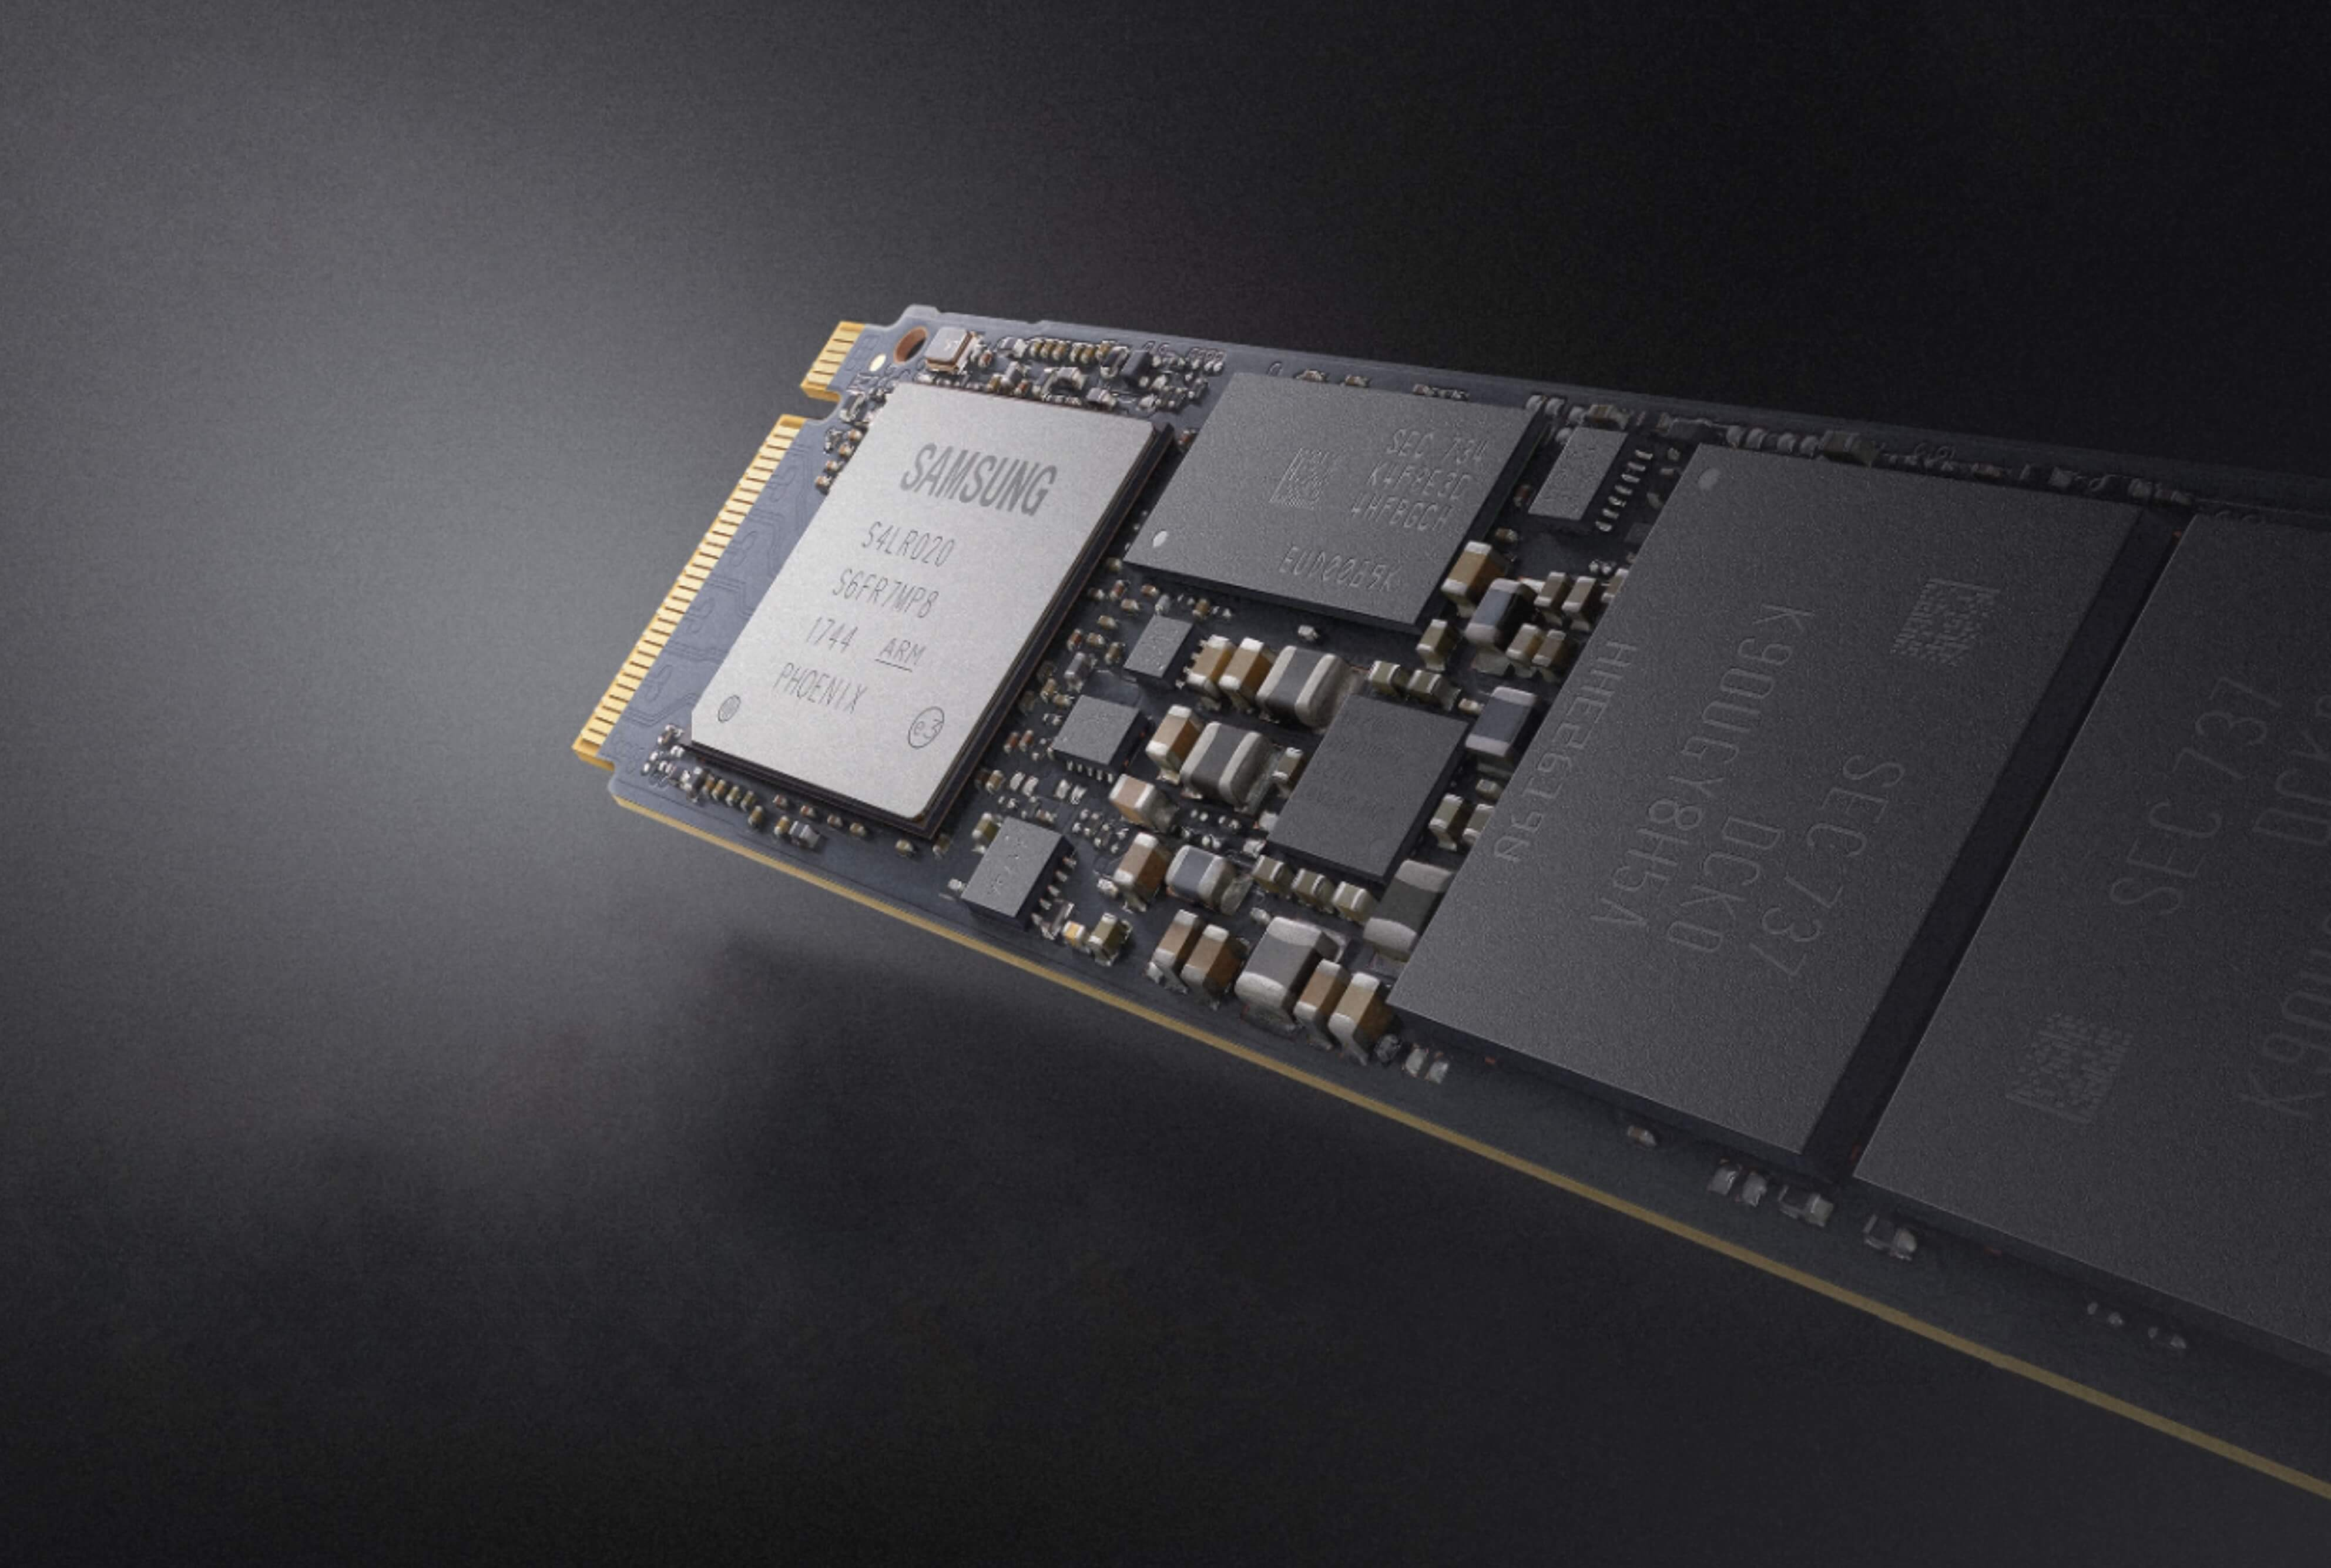 Seagate 500GB BarraCuda SSD SATA III 6Gb//s Internal SSD Drive with Corsair Dual